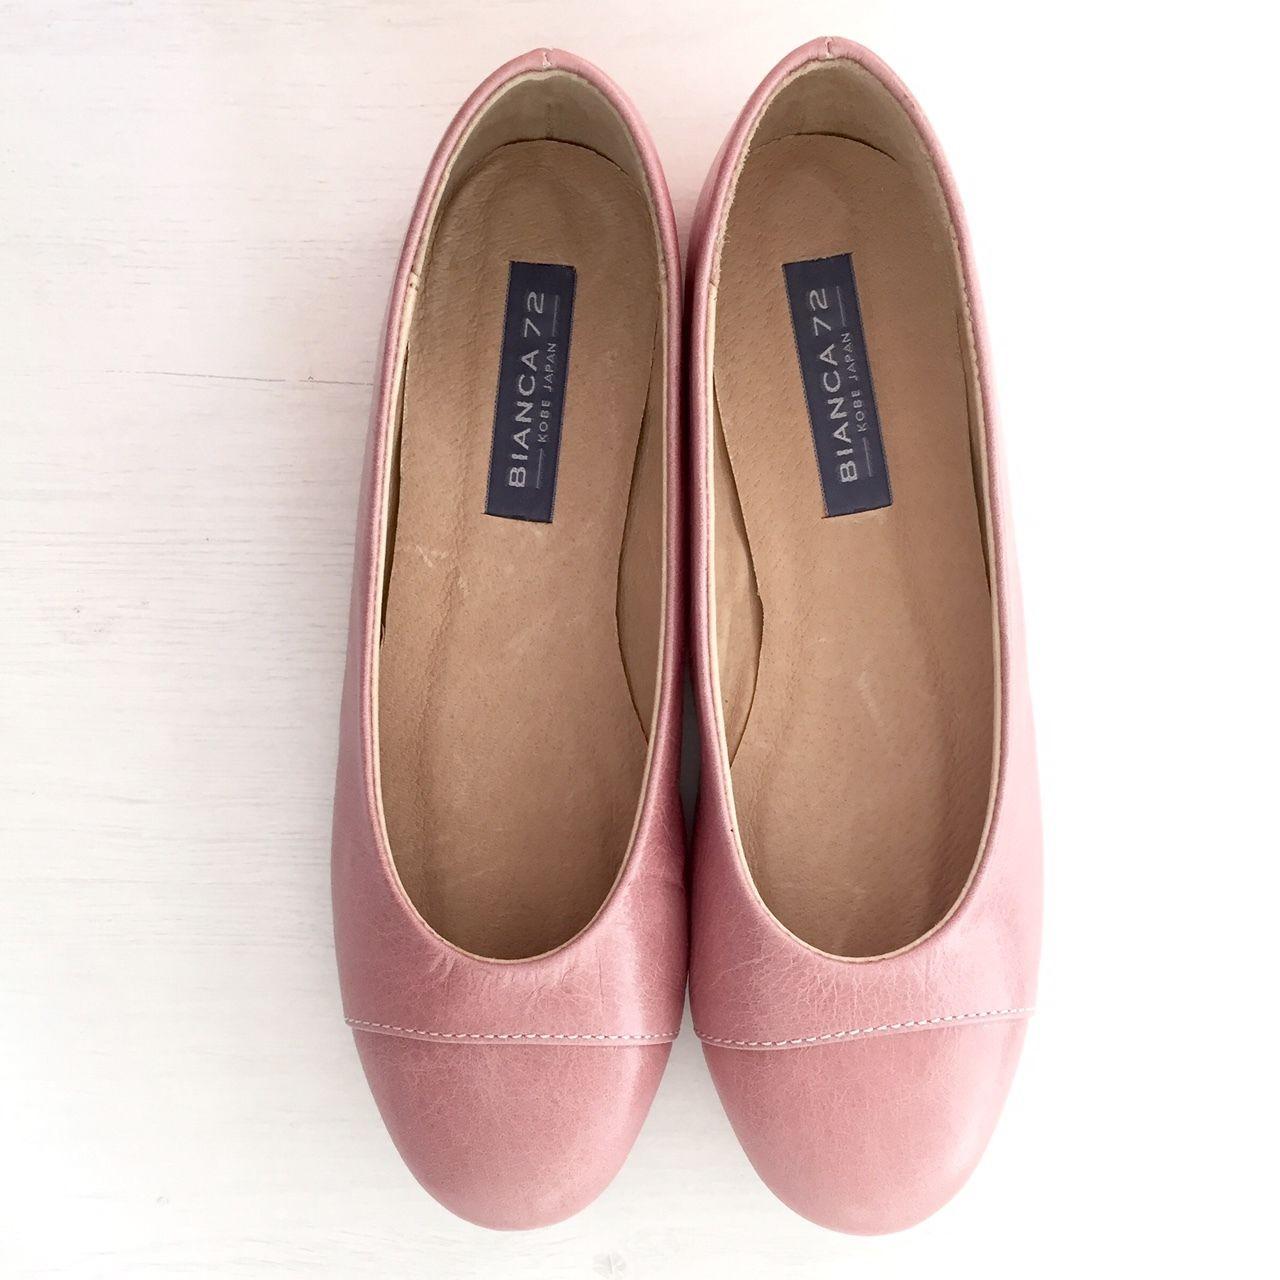 Original handmade leather ballet shoes[MACARON]オリジナルハンドメイドレザーバレエ「マカロン」ピンク×ピンク